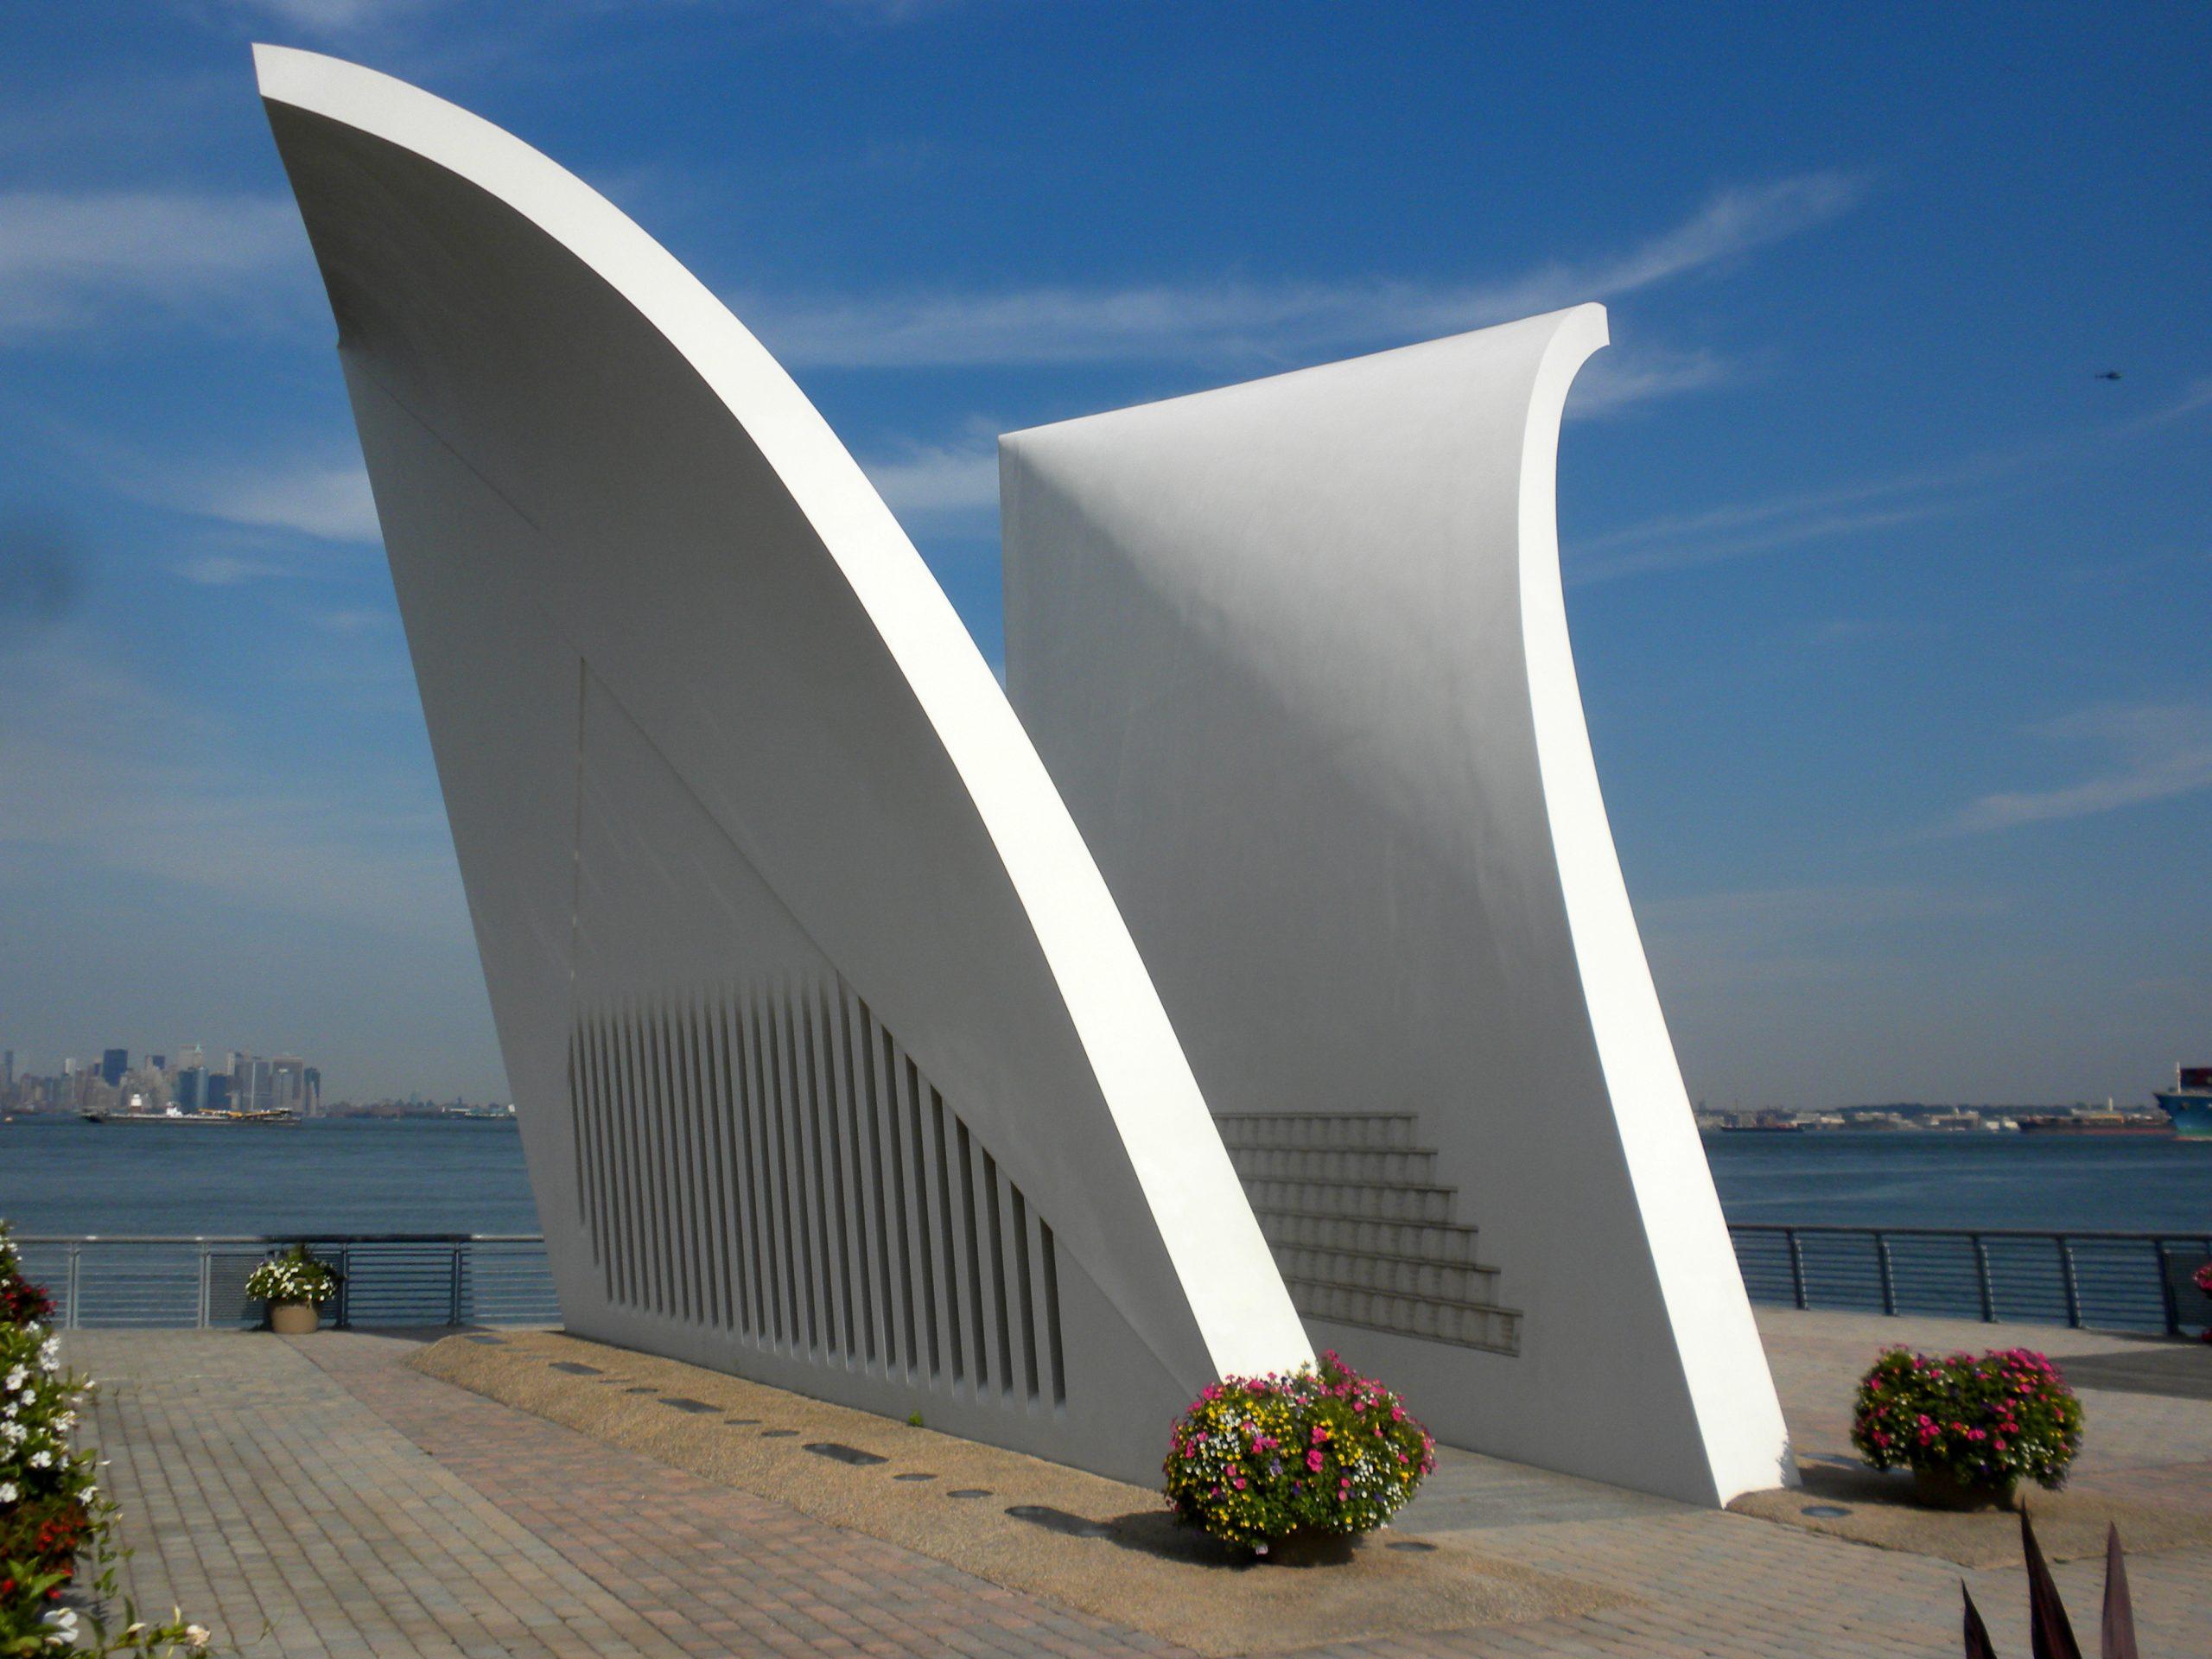 2010, Postcards, 9/11 memorial, St. George, Staten Island, New York